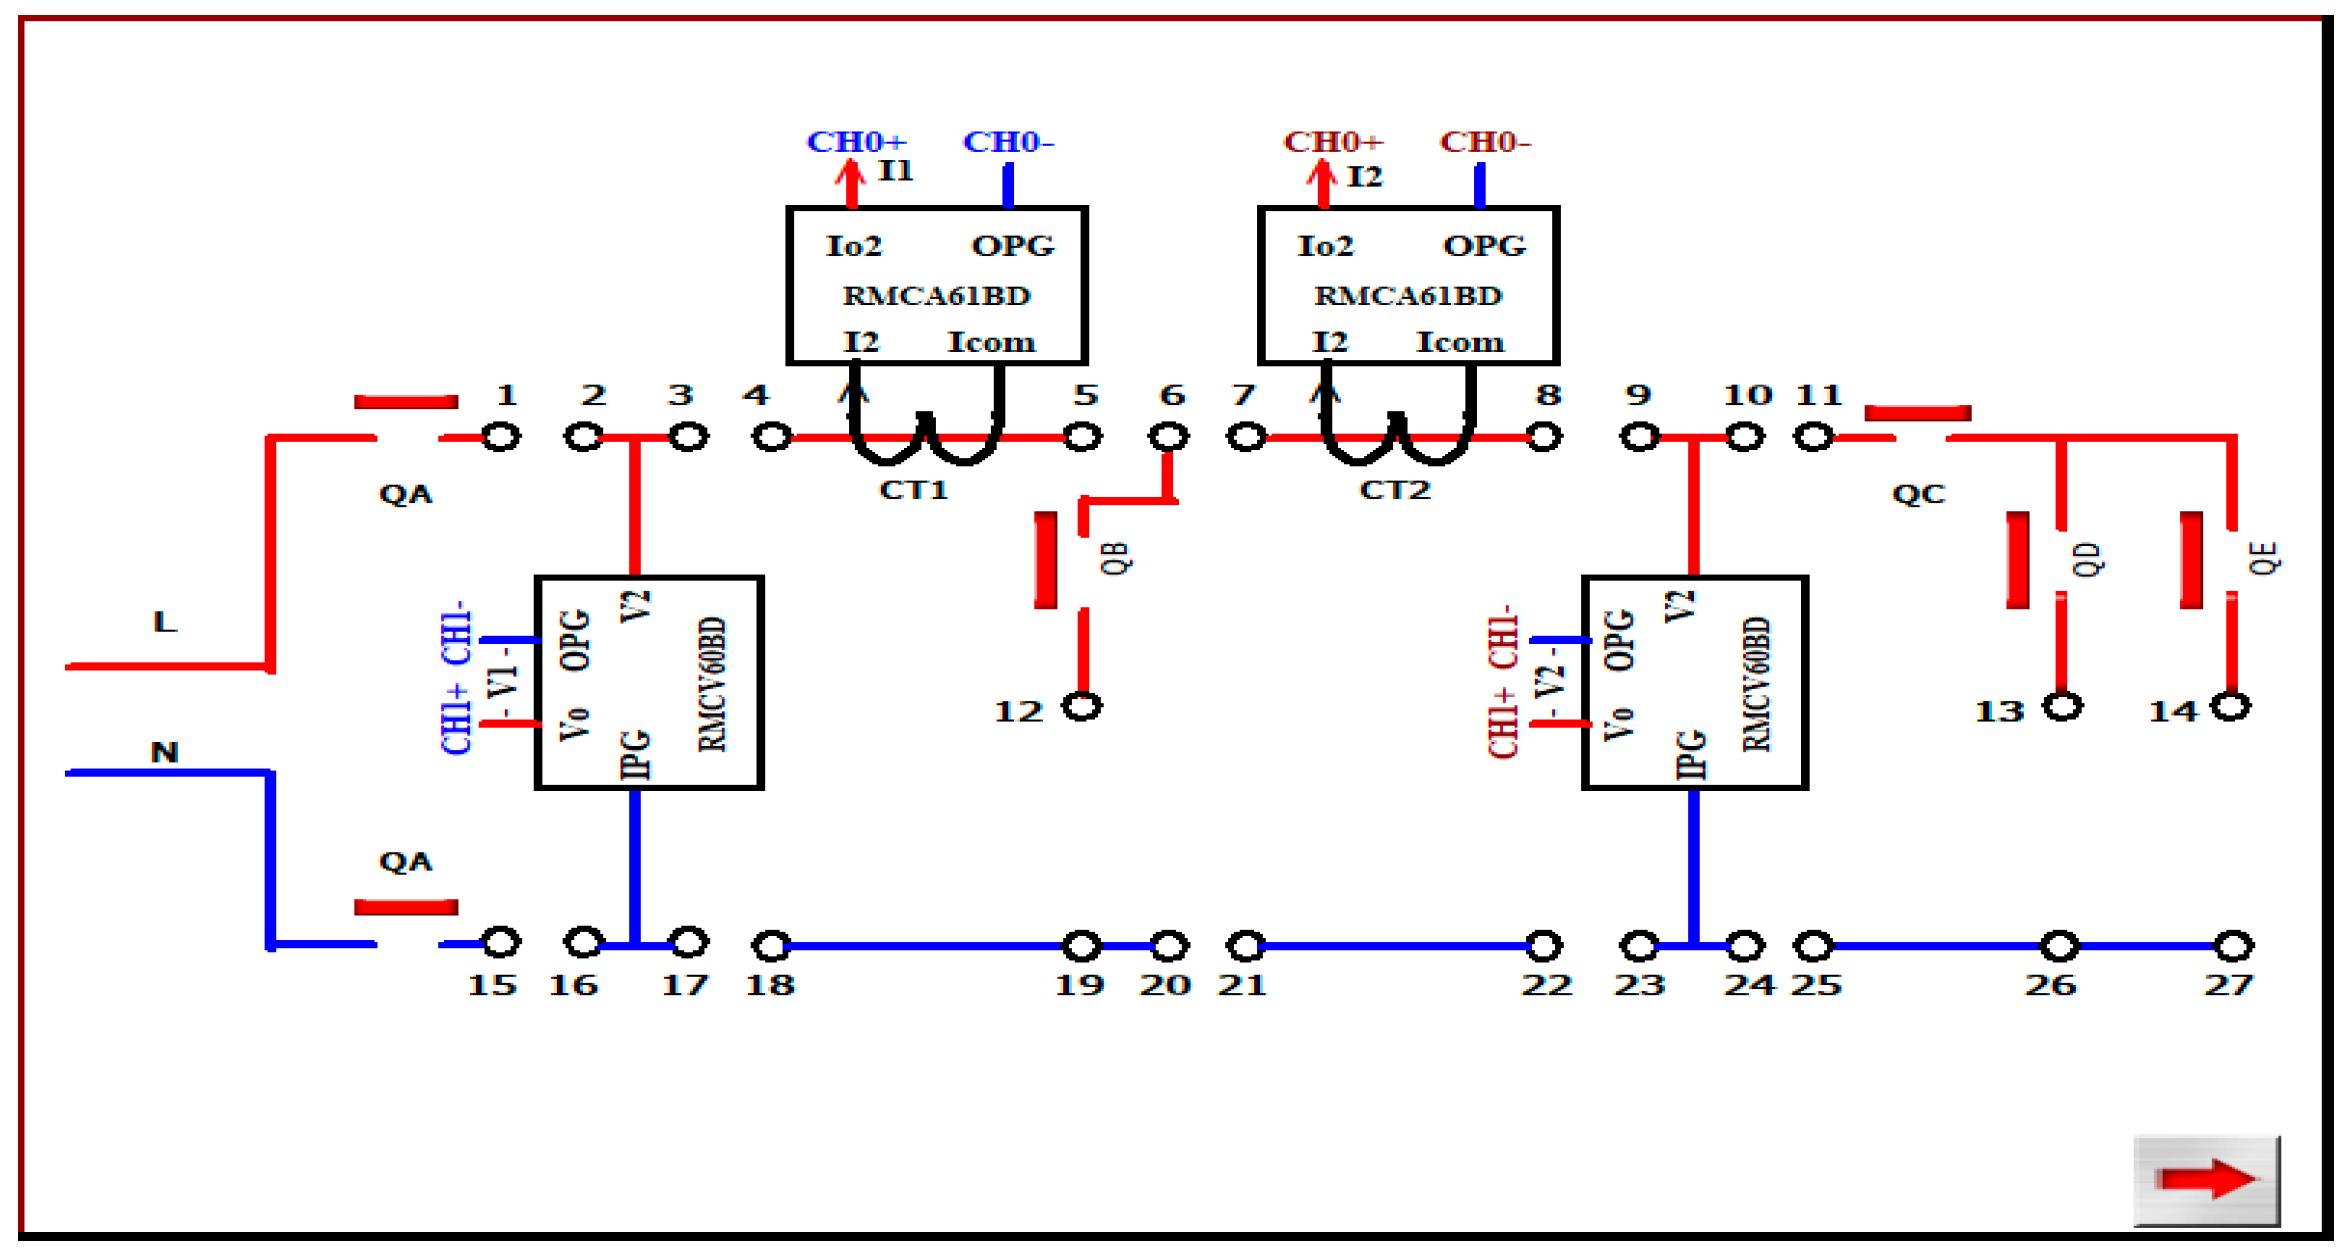 DIAGRAM] Wiring Kenwood Diagram Stereo Kdc Mp635car FULL Version HD Quality  Kdc Mp635car - NISSANDIAGRAMS.FABIENDUCHAUX.FRnissandiagrams.fabienduchaux.fr